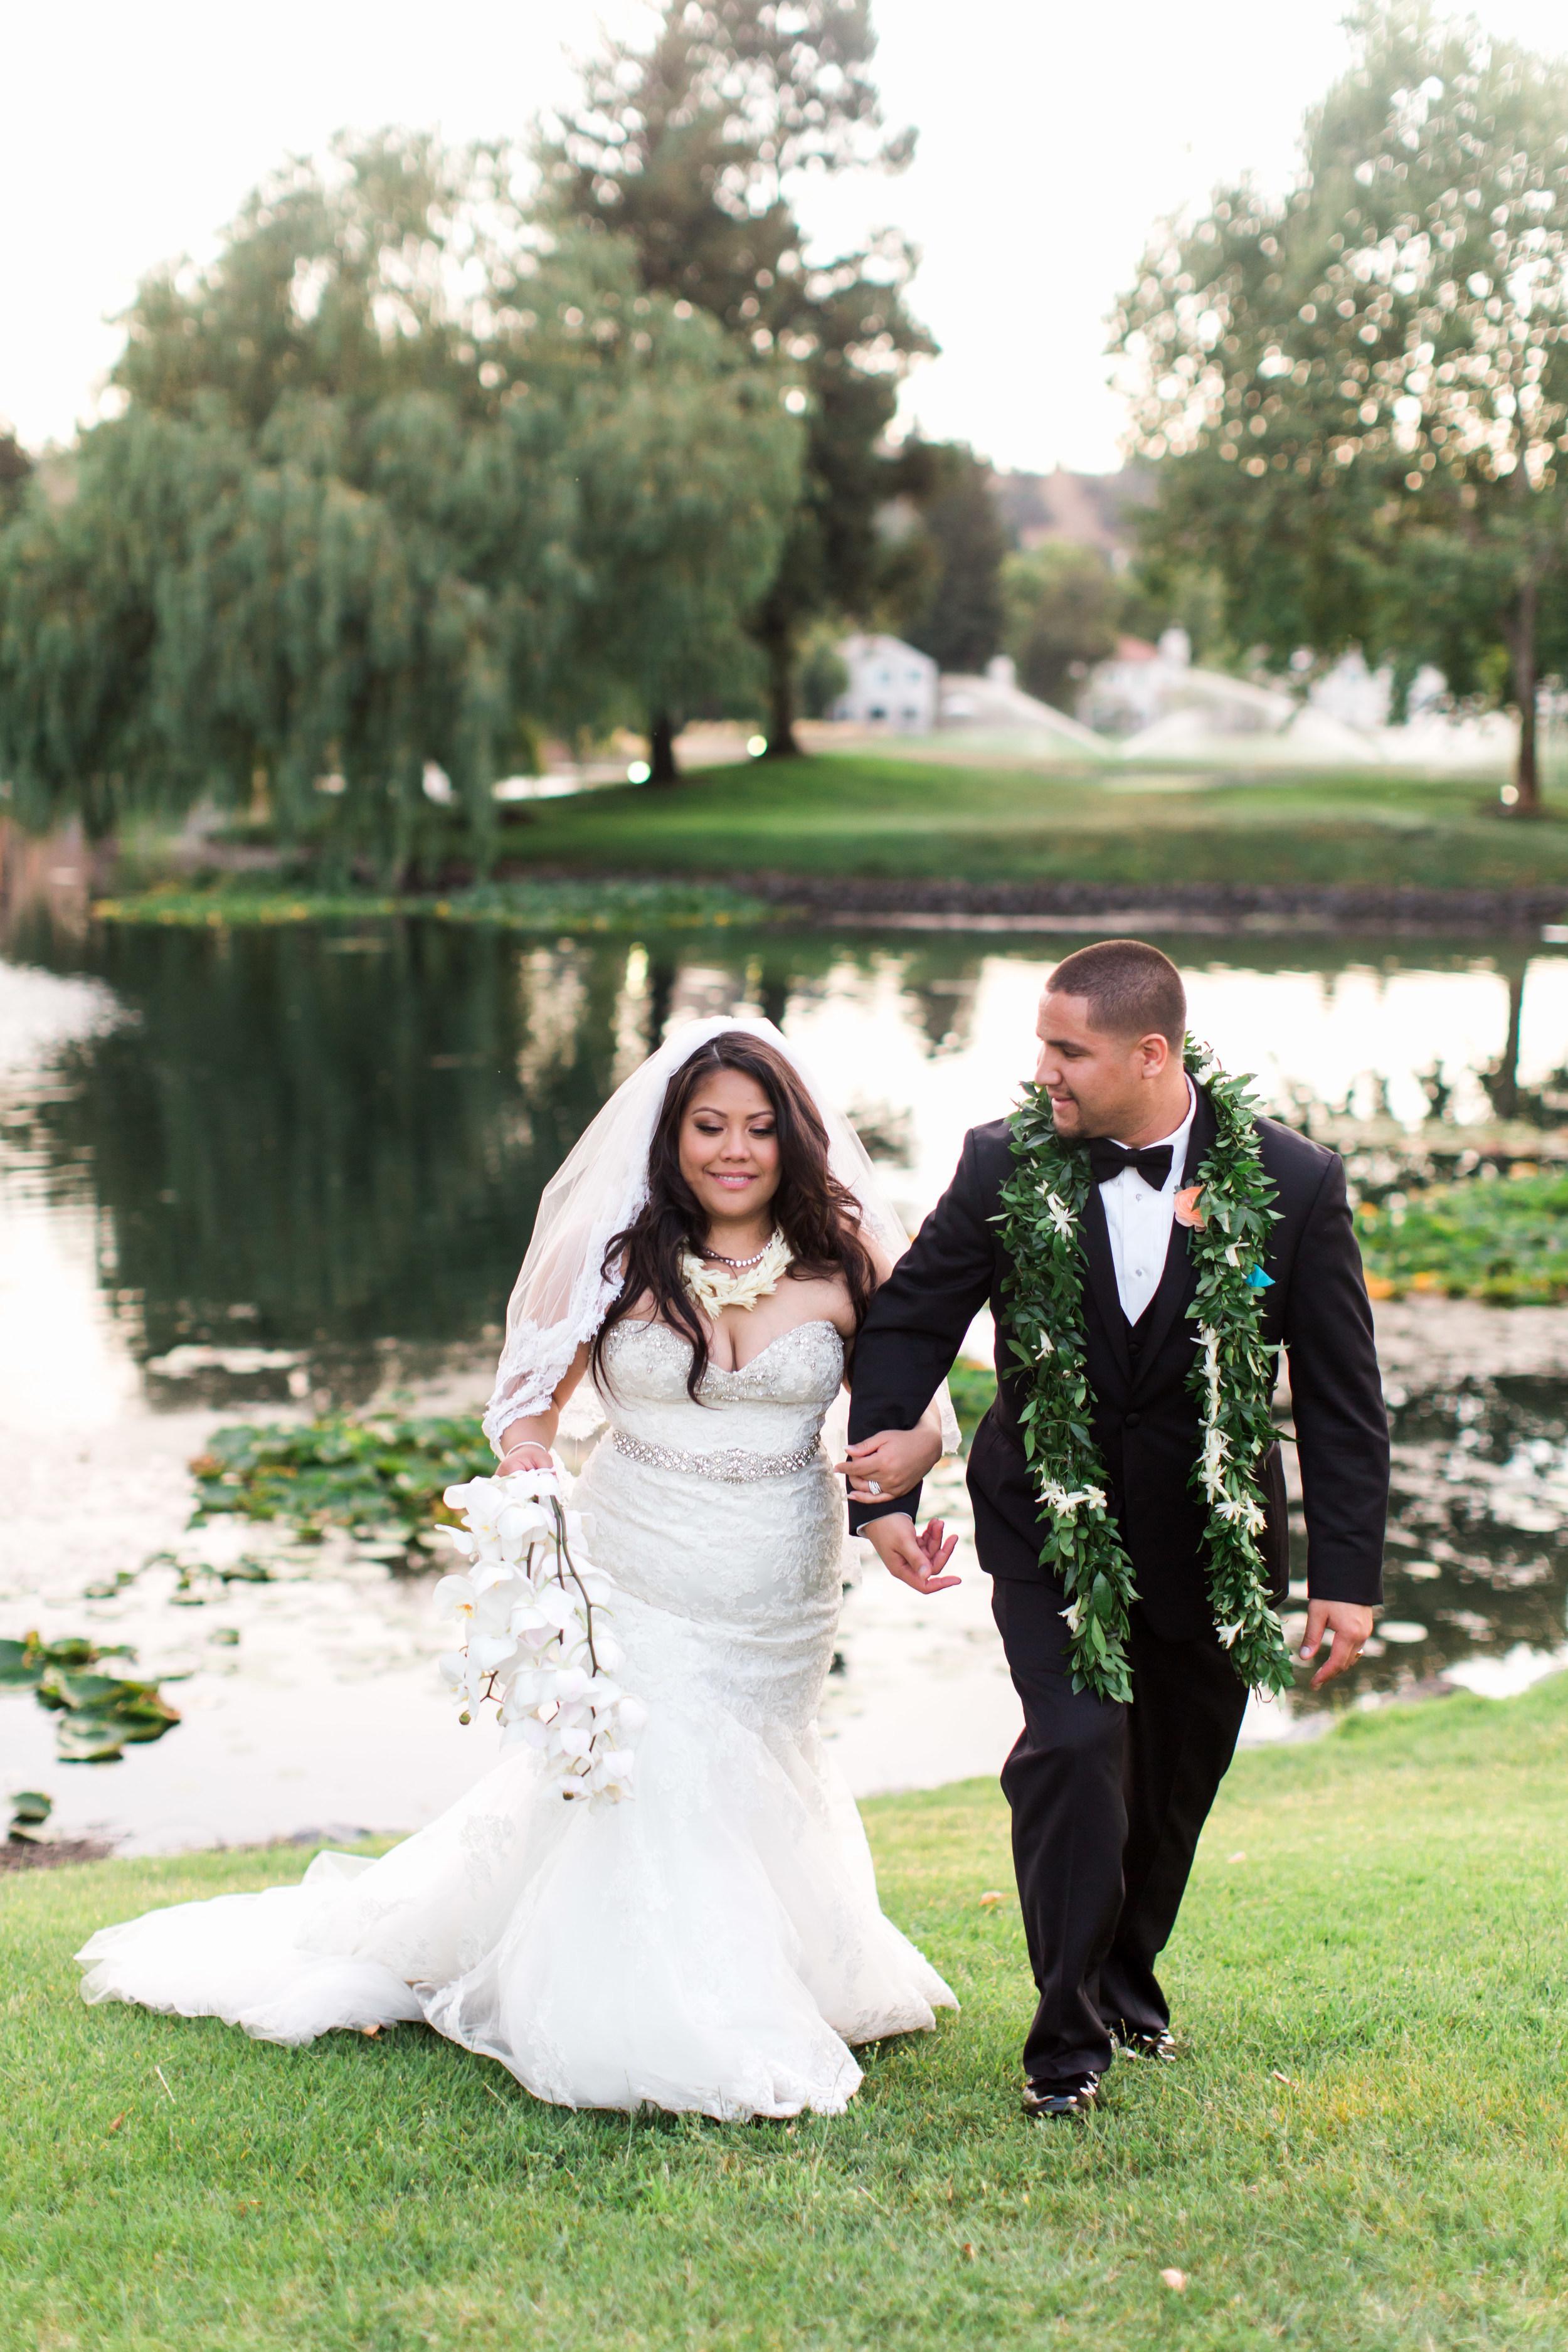 hawaiian-inspired-wedding-at-blackhawk-country-club-3407.jpg